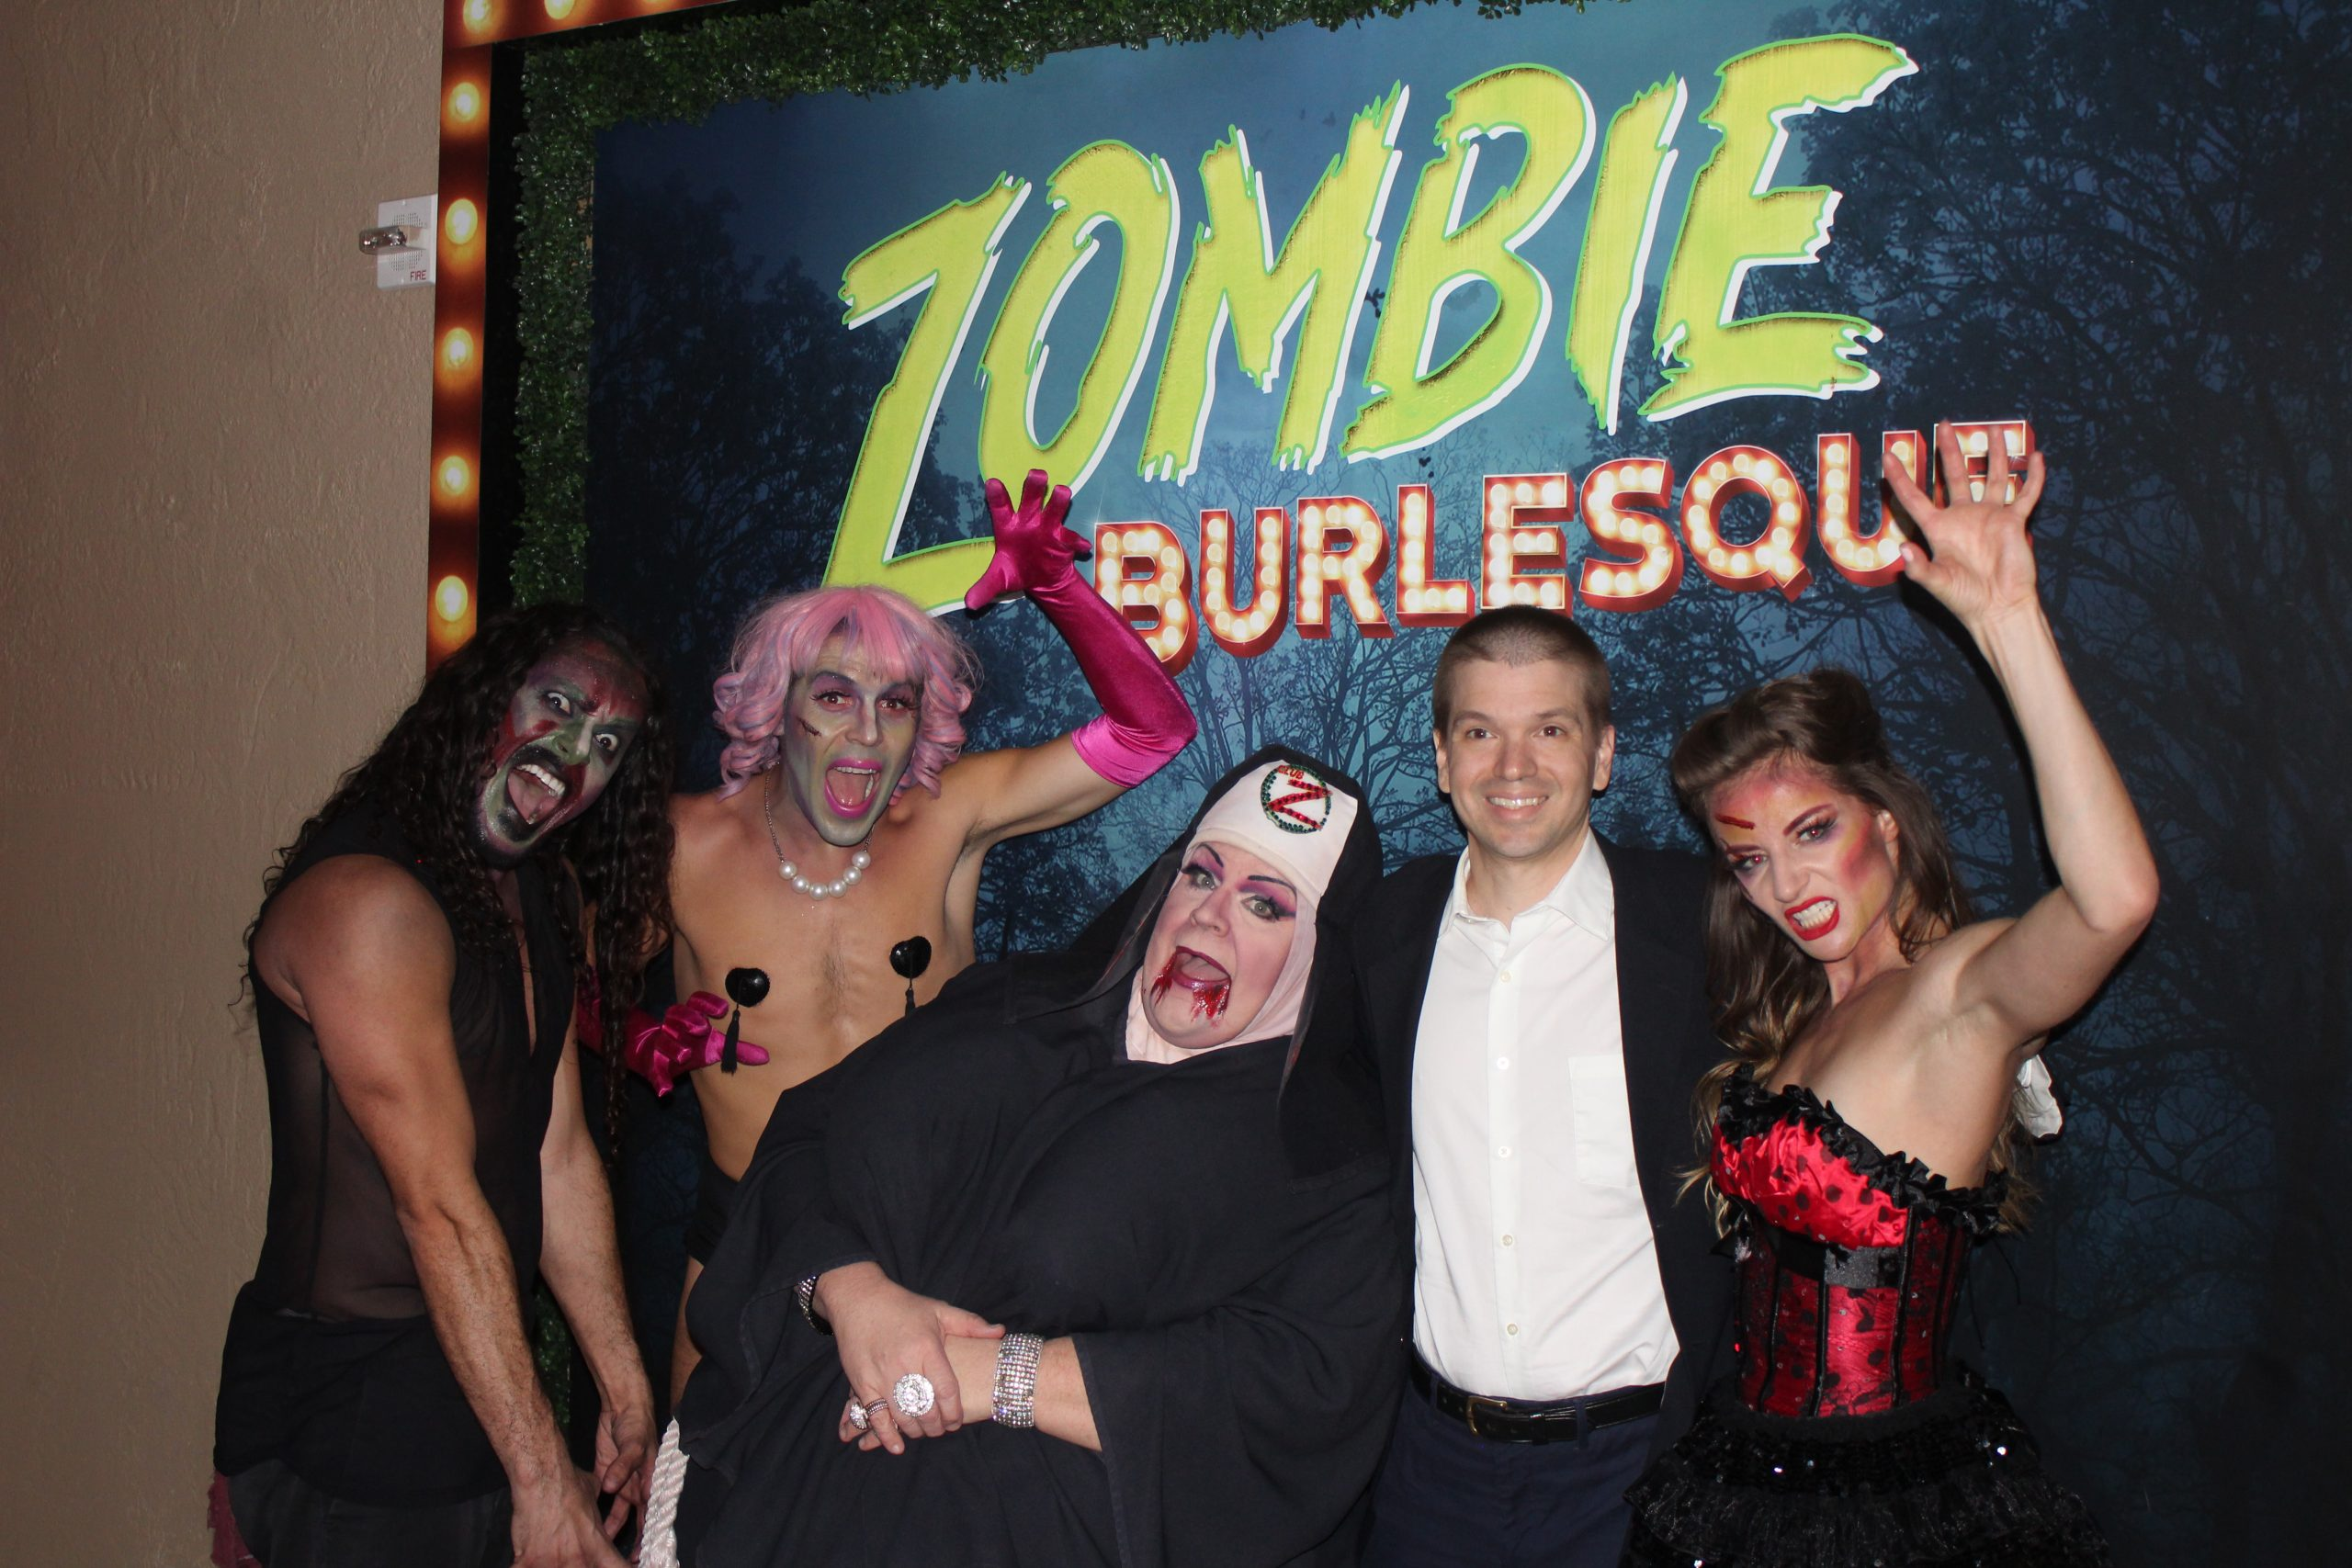 Chris Yandek, Zombie Burlesque Las Vegas Show, Zombie Burlesque Las Vegas Show Cast, Zombie Burlesque 2019, Jeffery DeBarathy, Corey Heaps, Steve Daly, Katie Matthews, Zombie Burlesque Las Vegas Show